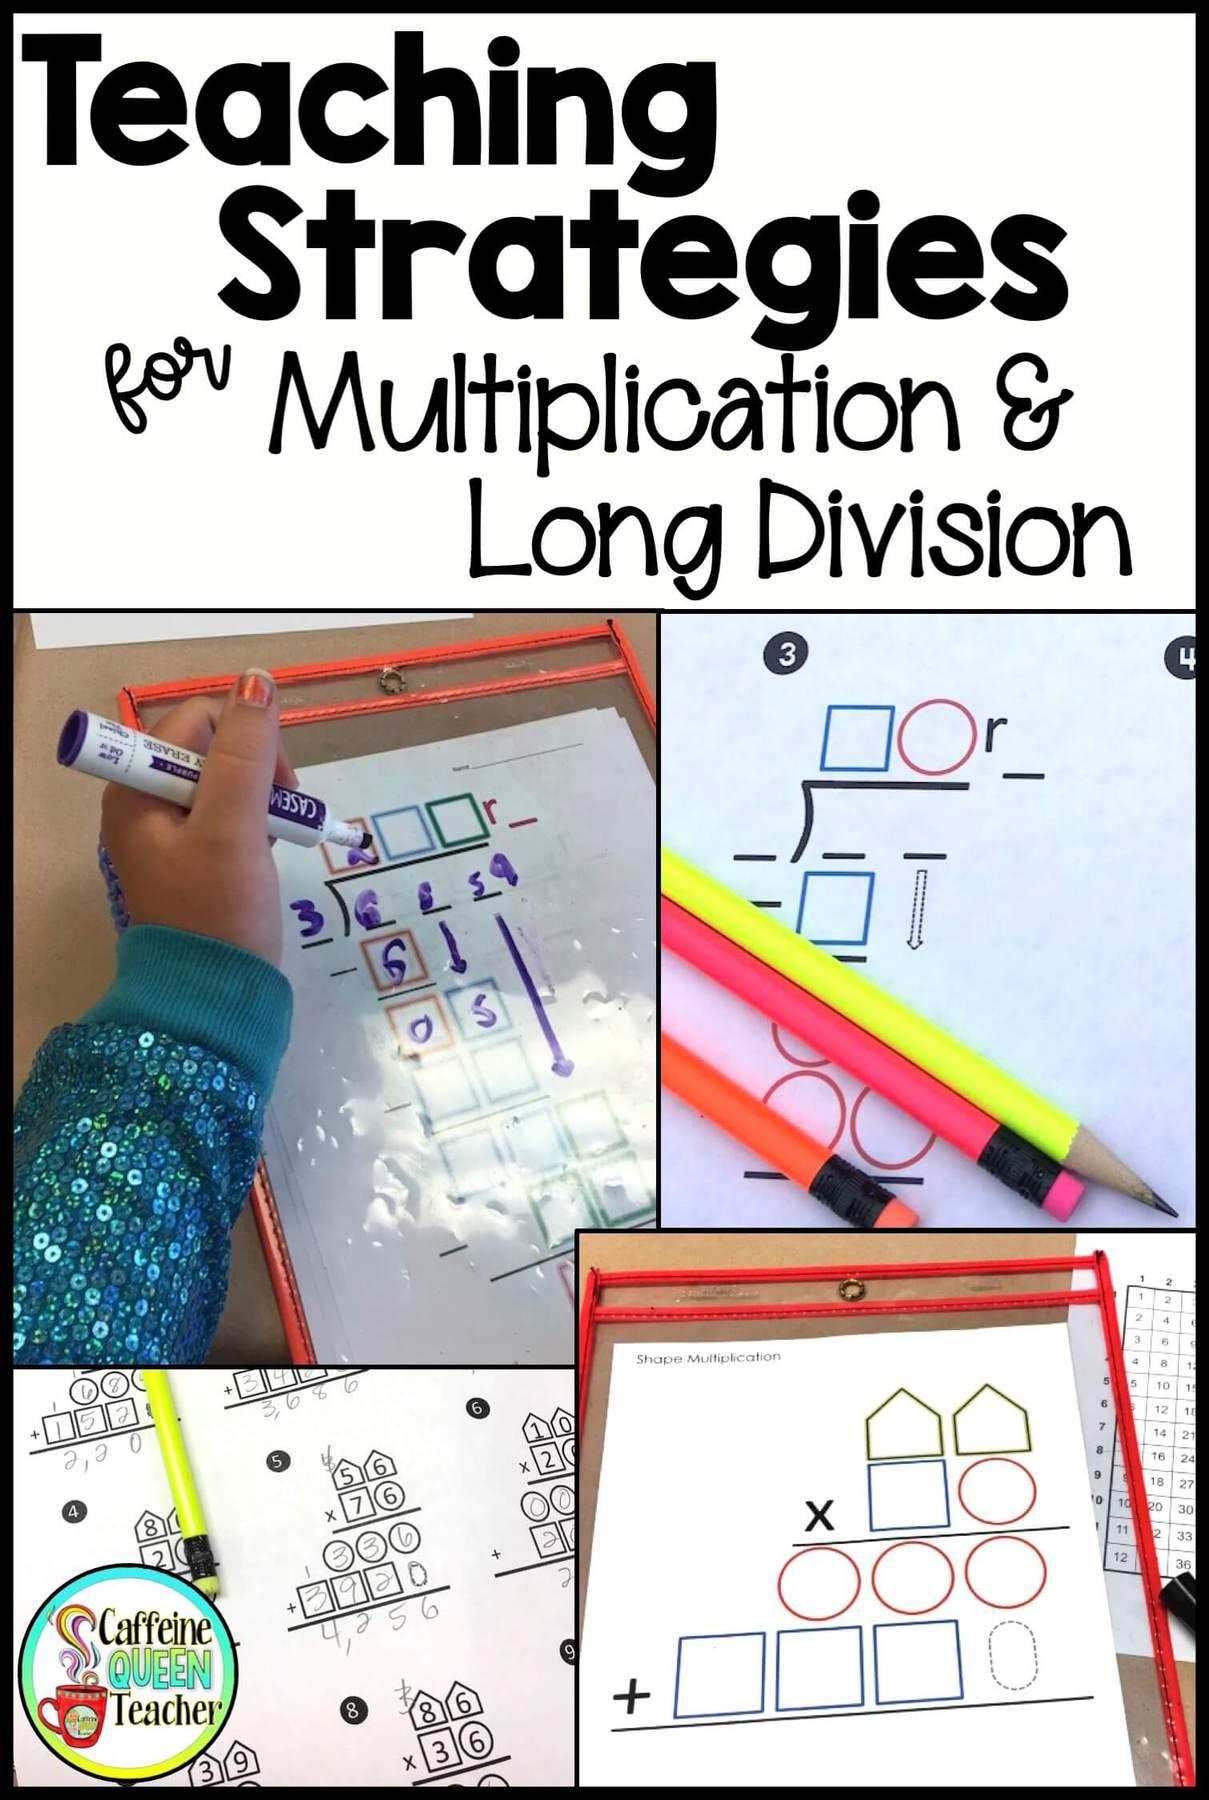 medium resolution of How to Teach Multi-Digit Multiplication and Long Division - Caffeine Queen  Teacher